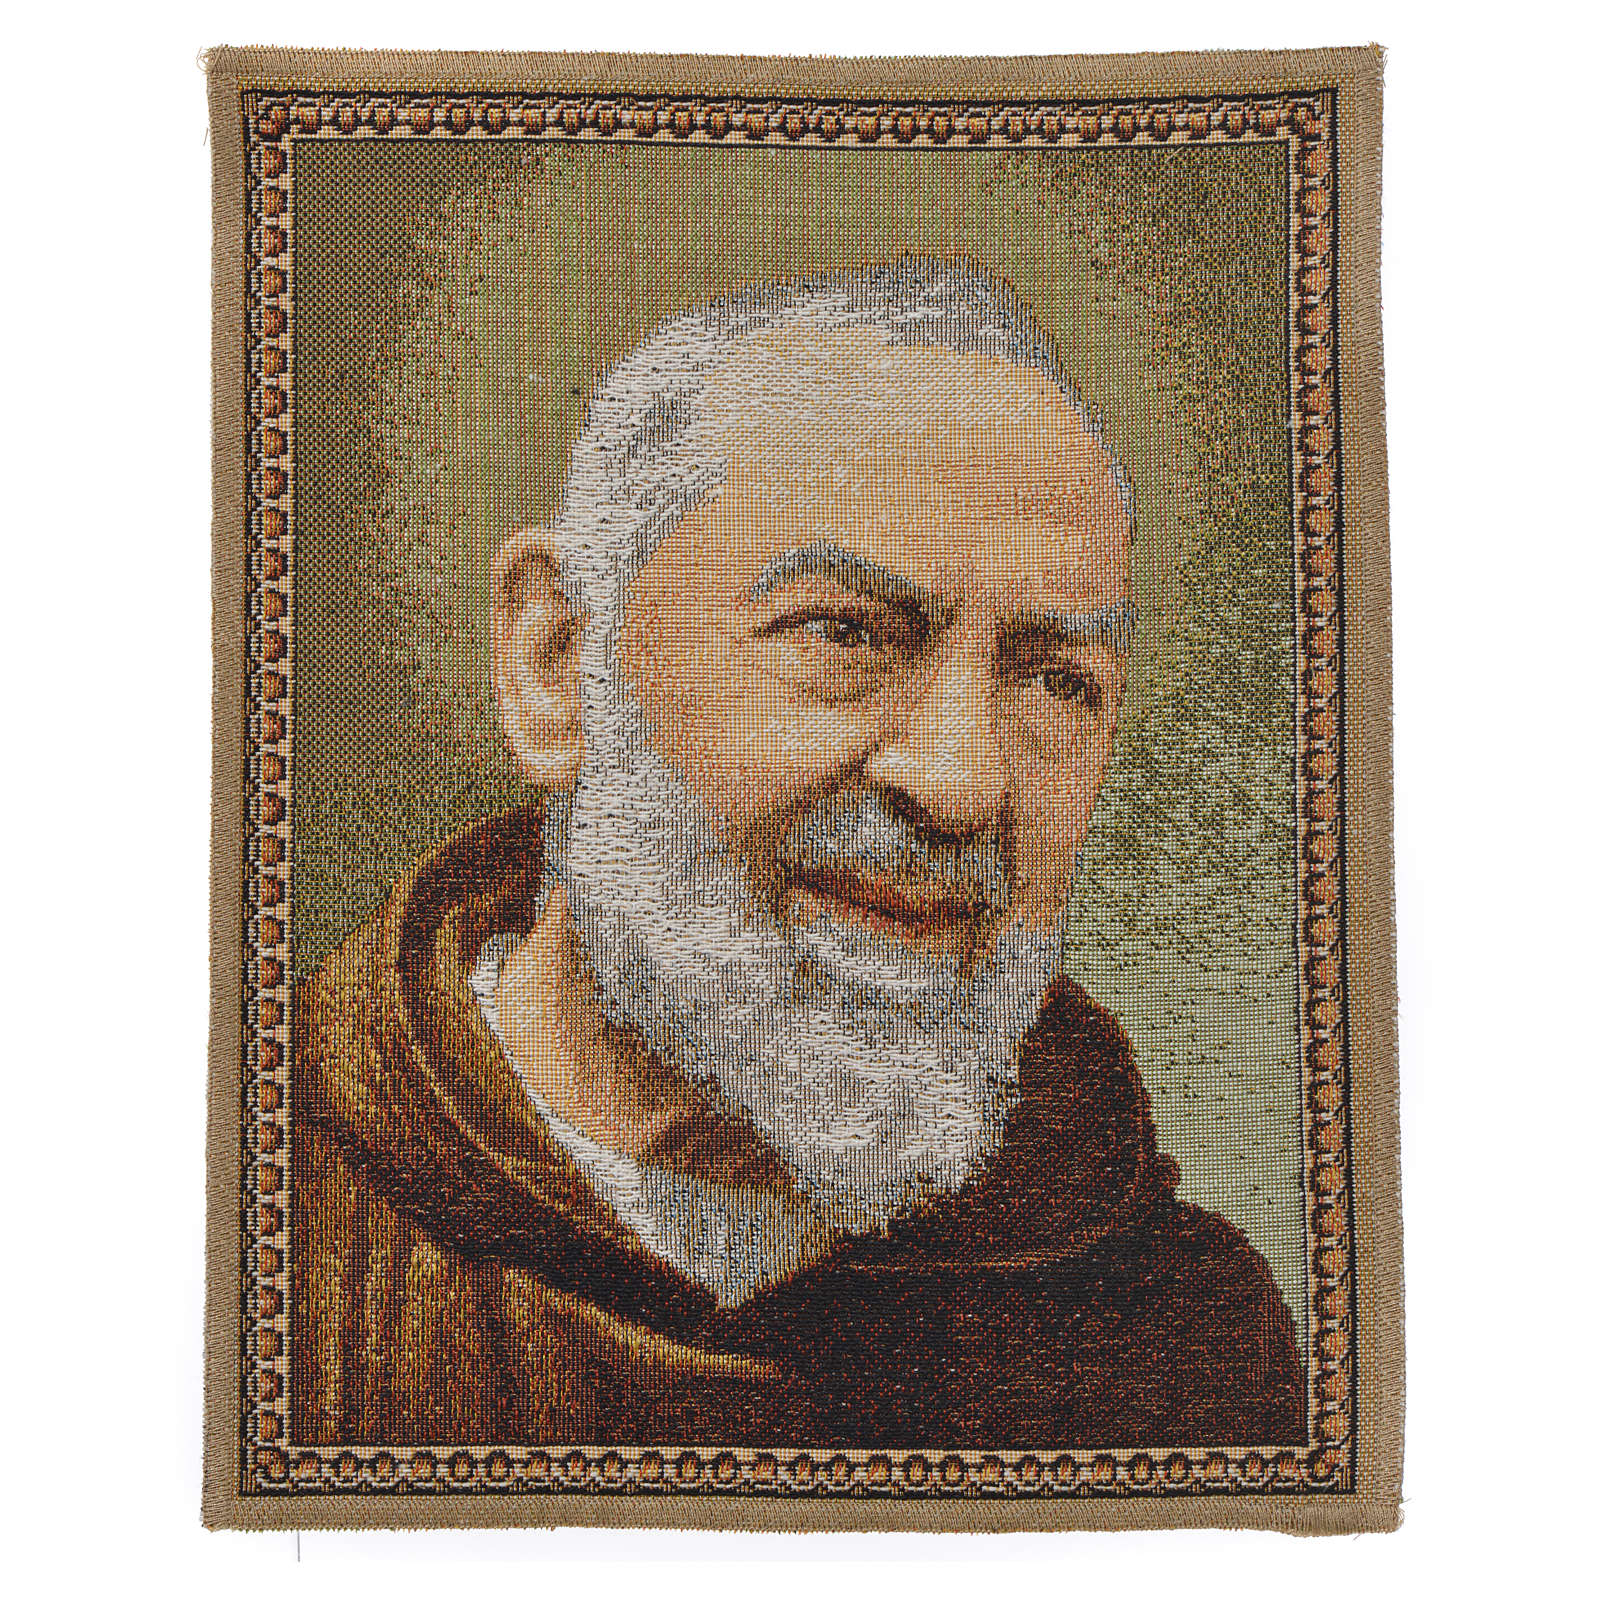 Tapiz con Padre Pío de Pietrelcina 3